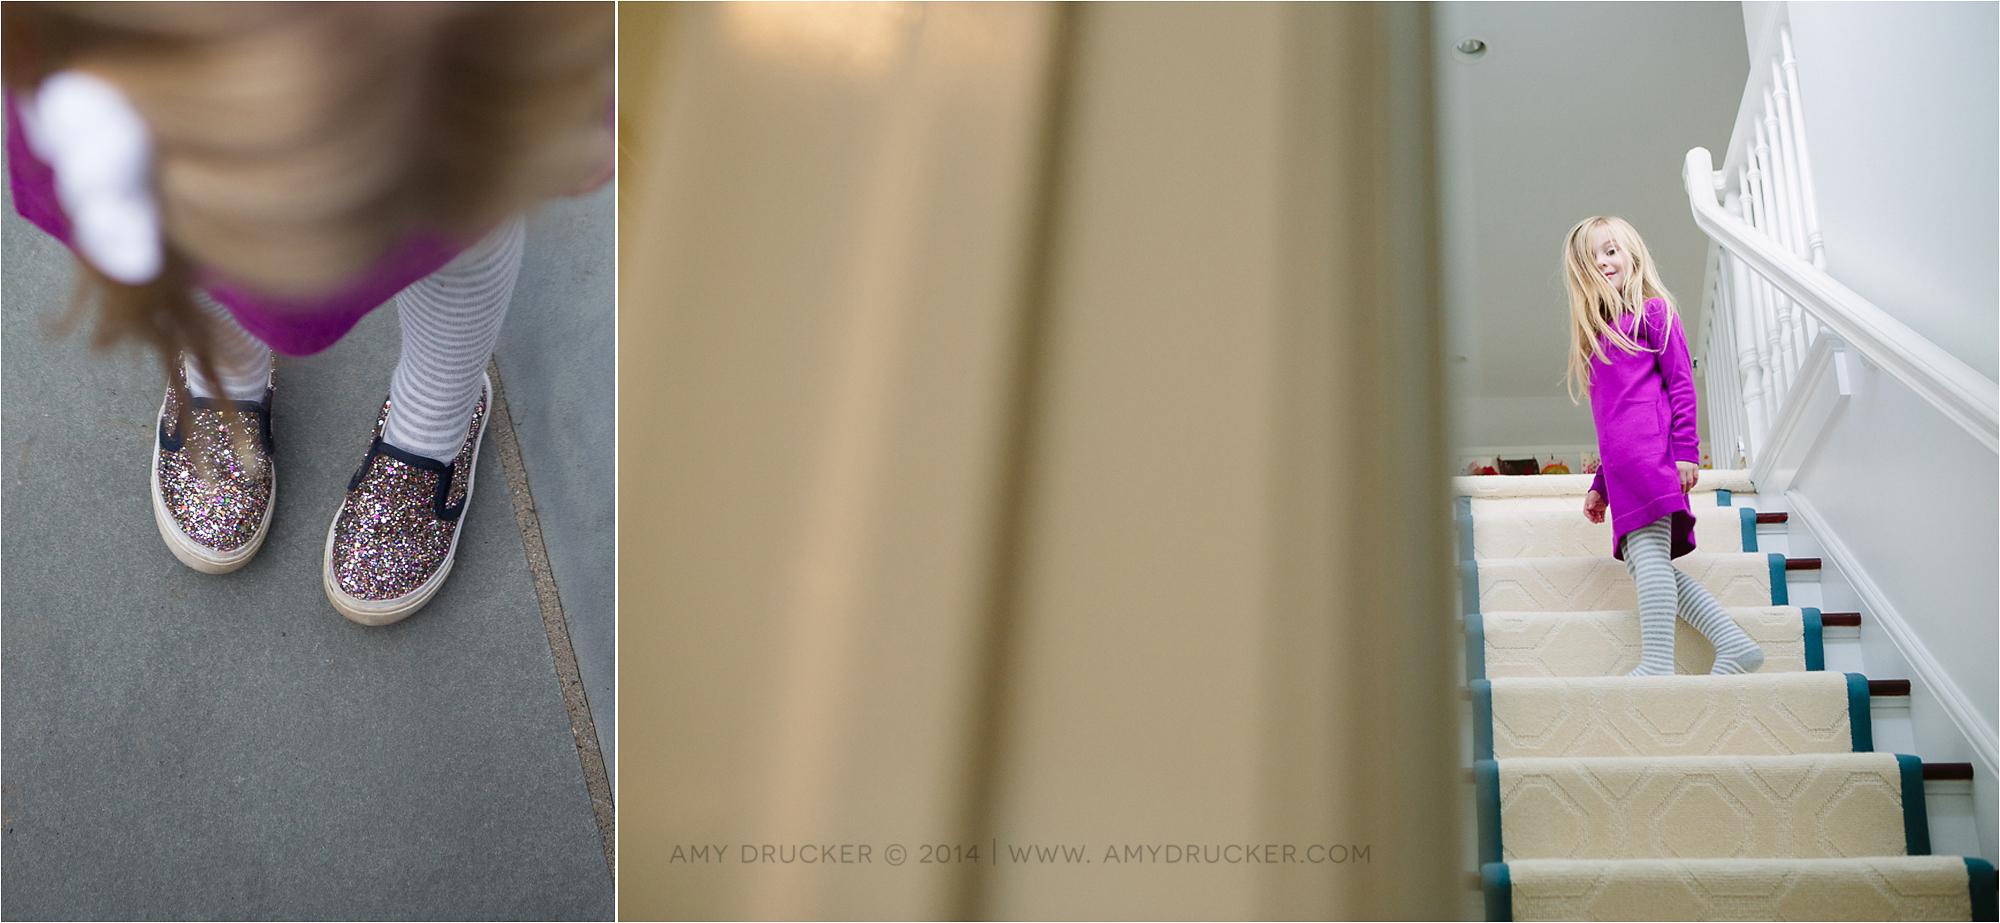 Amy_Drucker_New_York_Lifestyle_Photography7